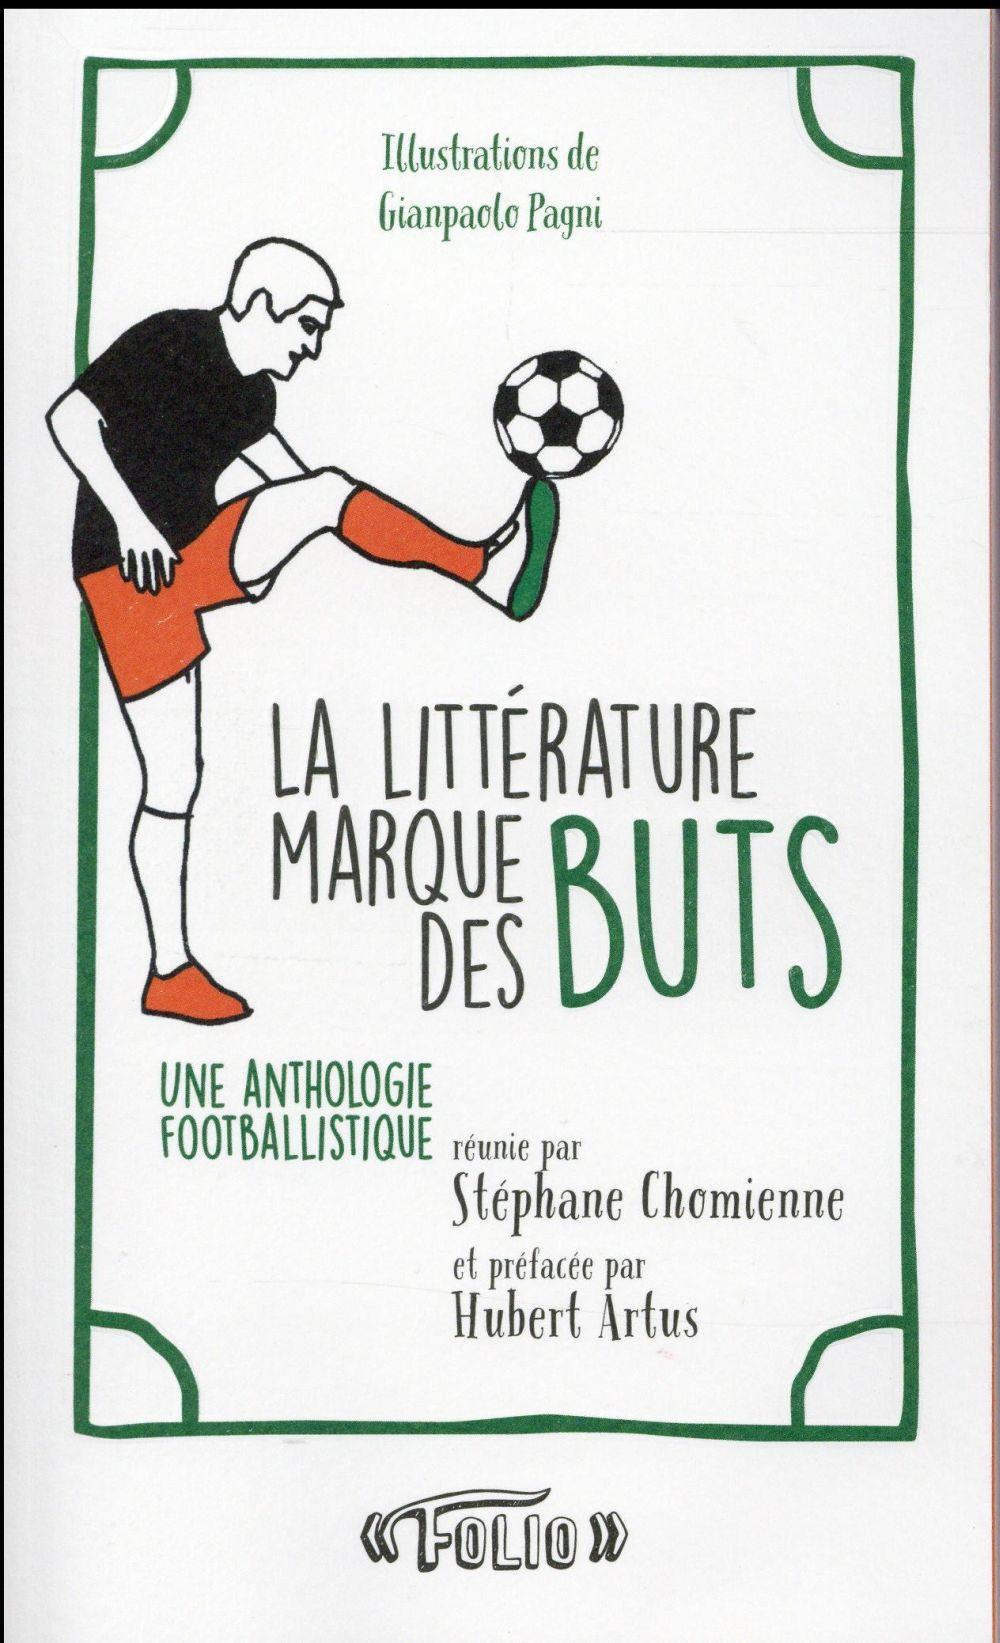 LA LITTERATURE MARQUE DES BUTS